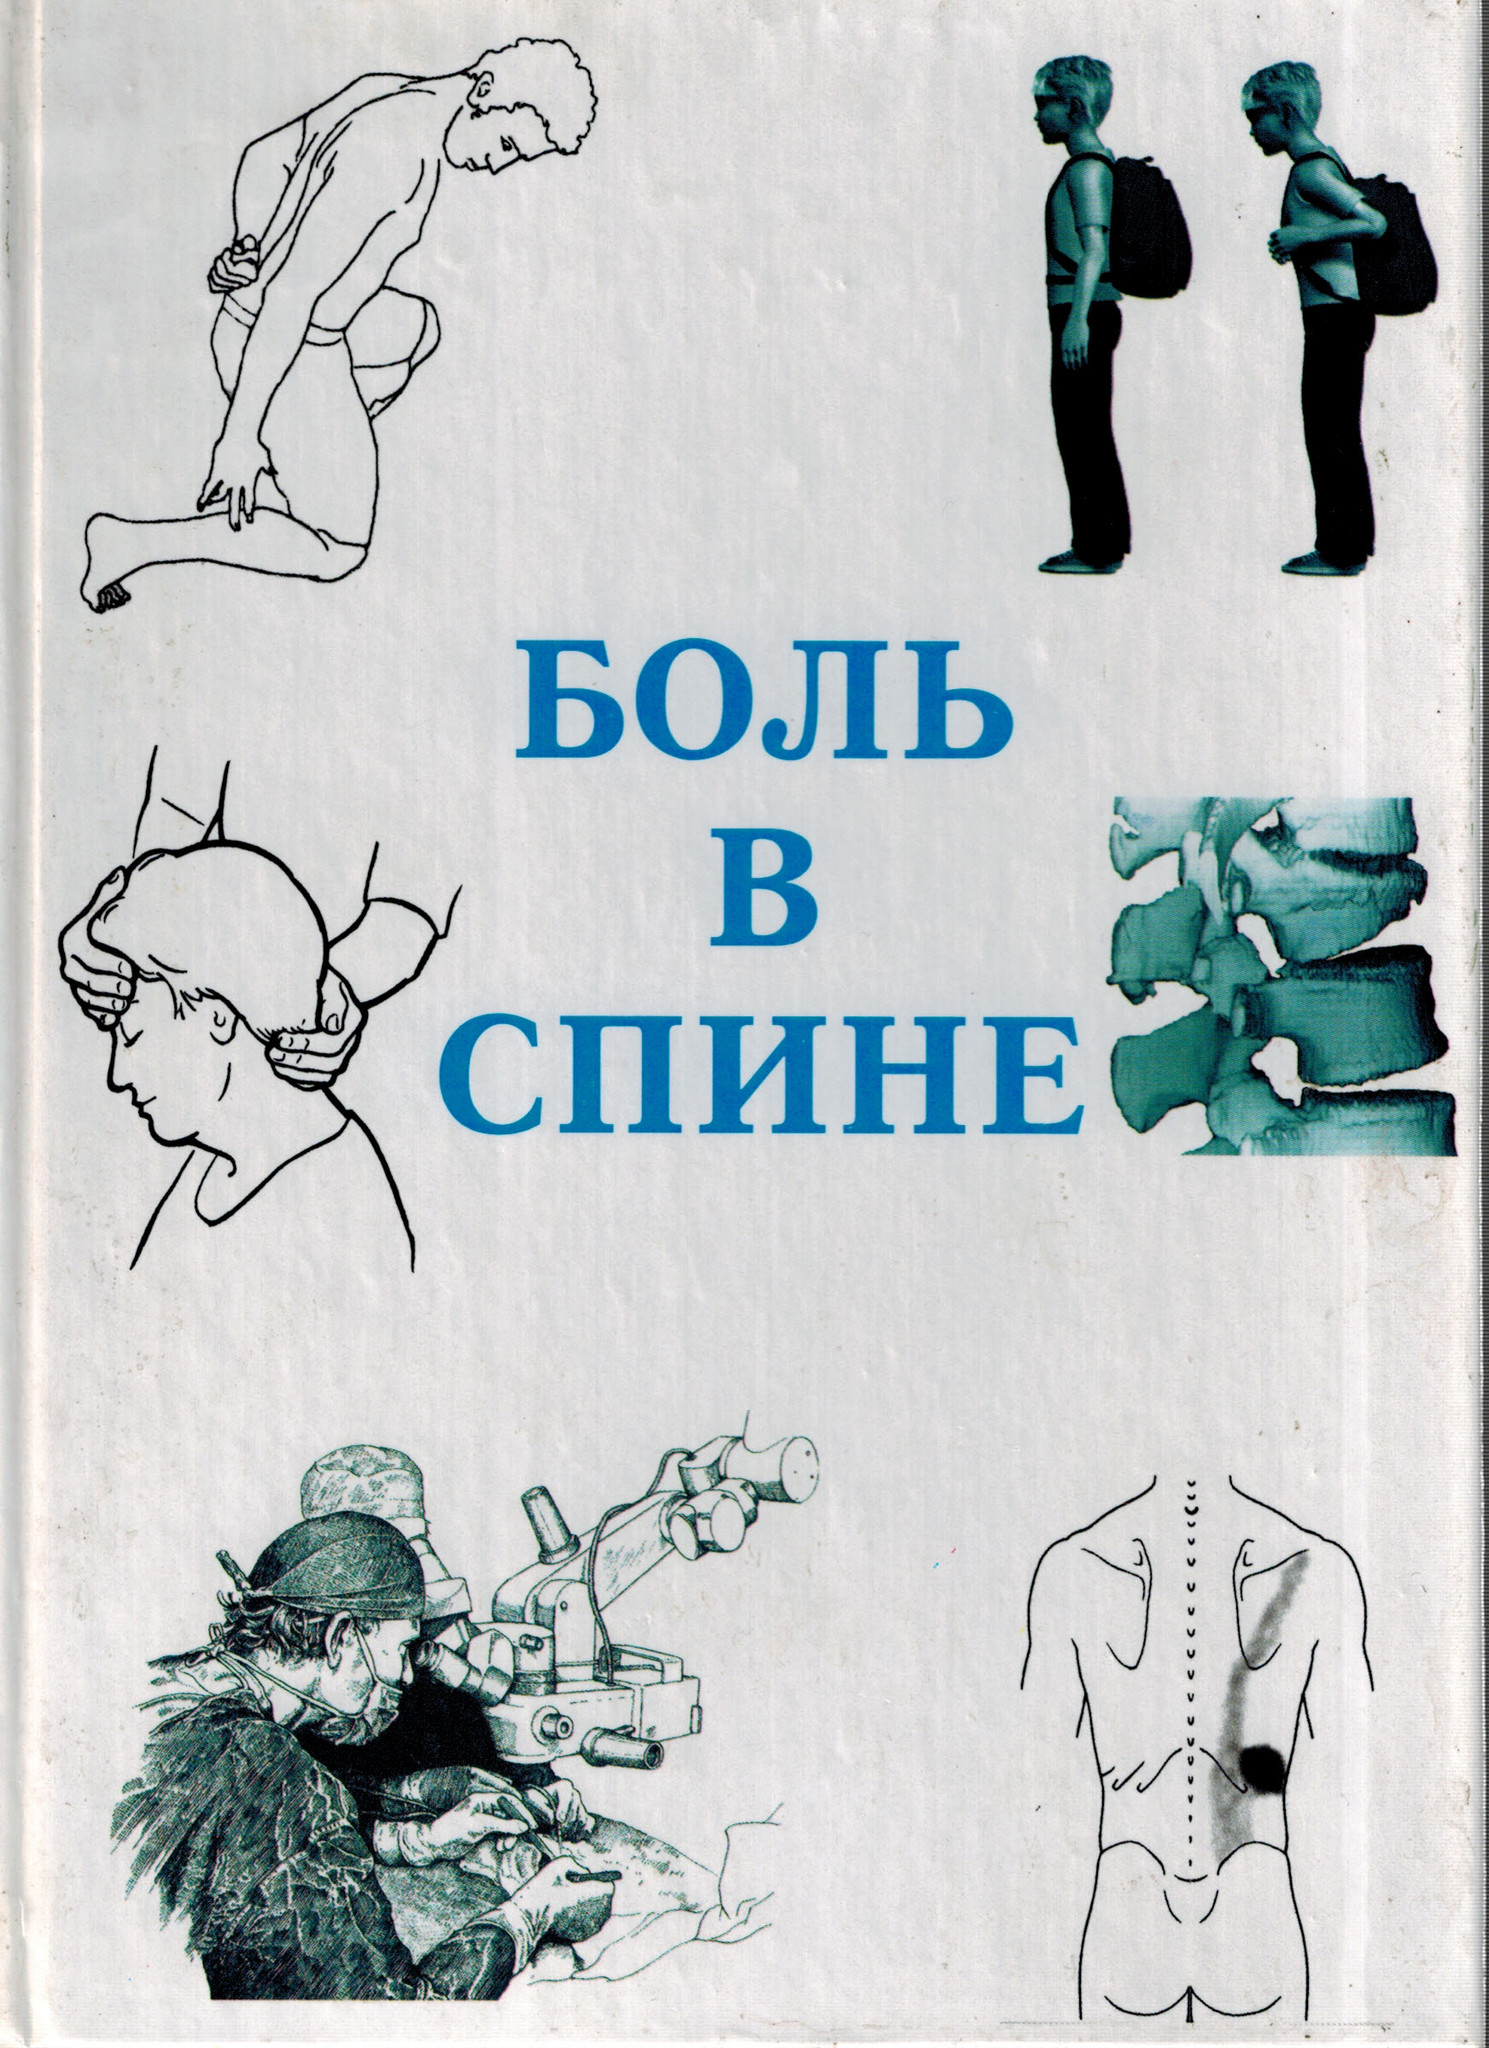 Каталог Боль в спине (Есин) bsch.jpg